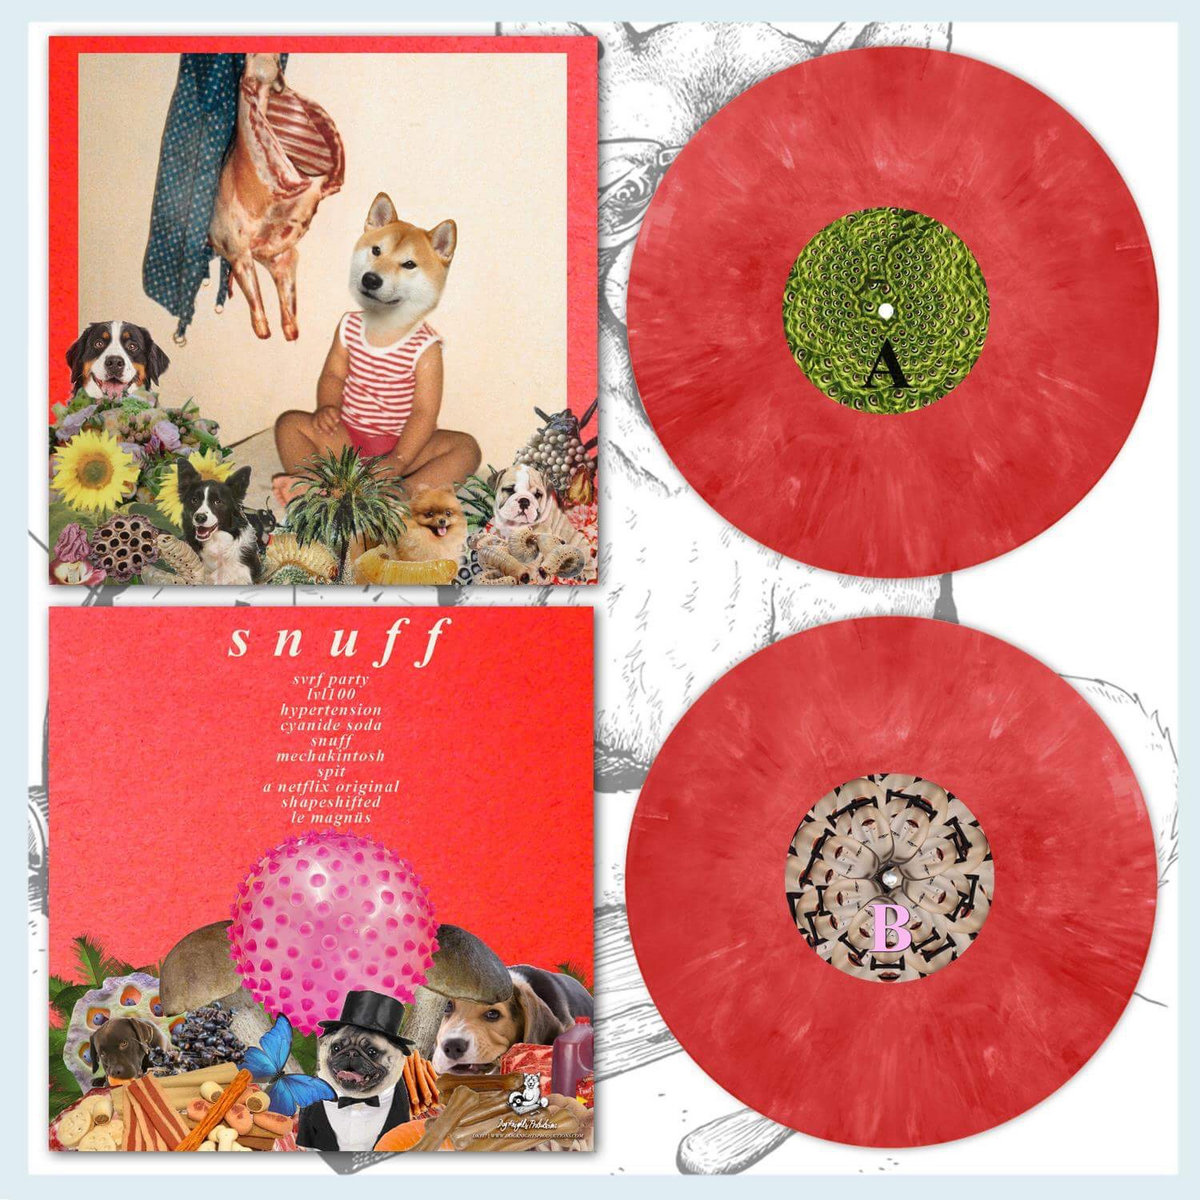 Snuff Red LP